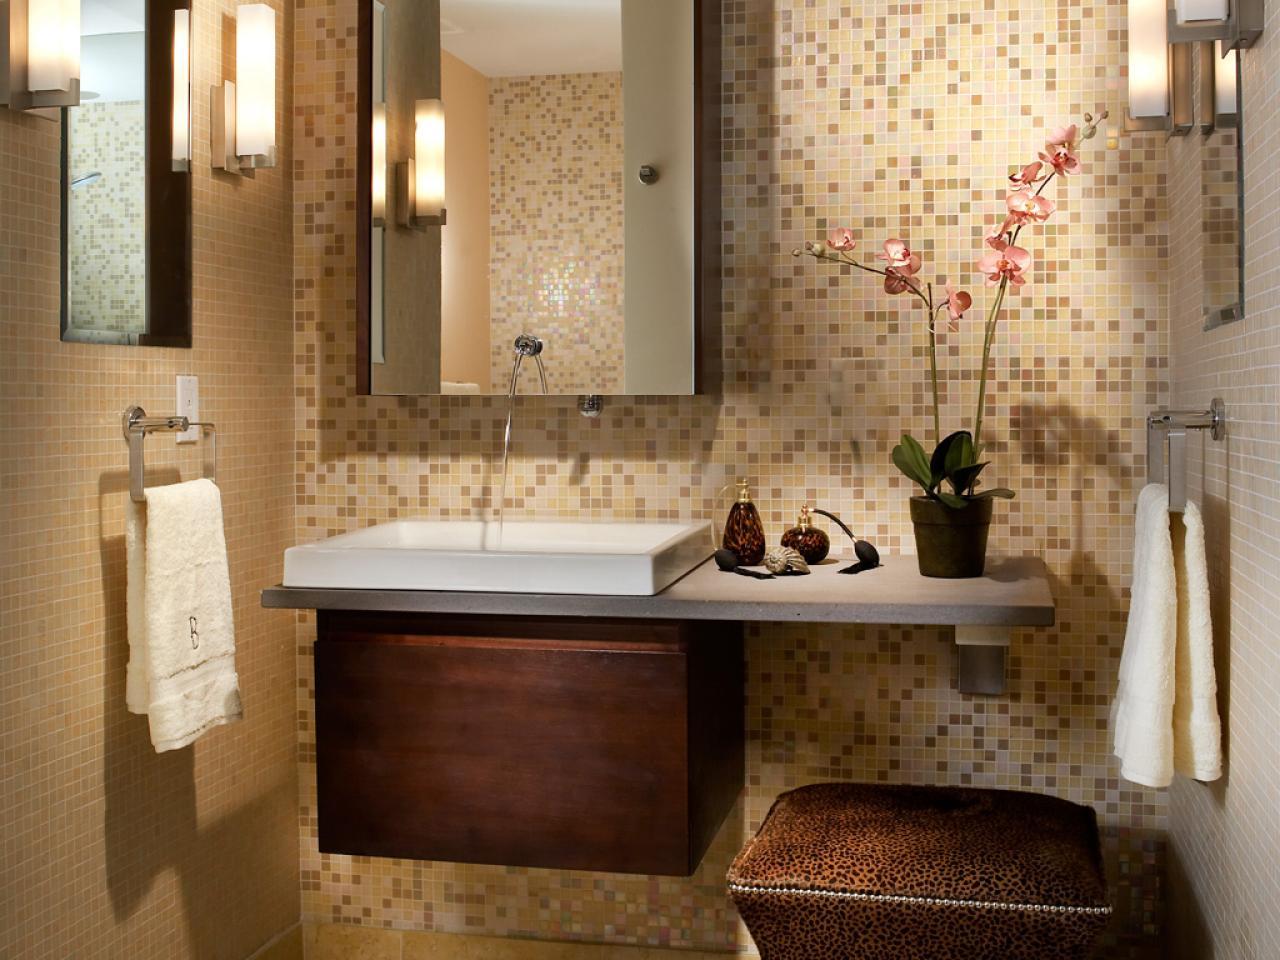 6 Ways To Maximize Space In The Bathroom Diy Bathroom